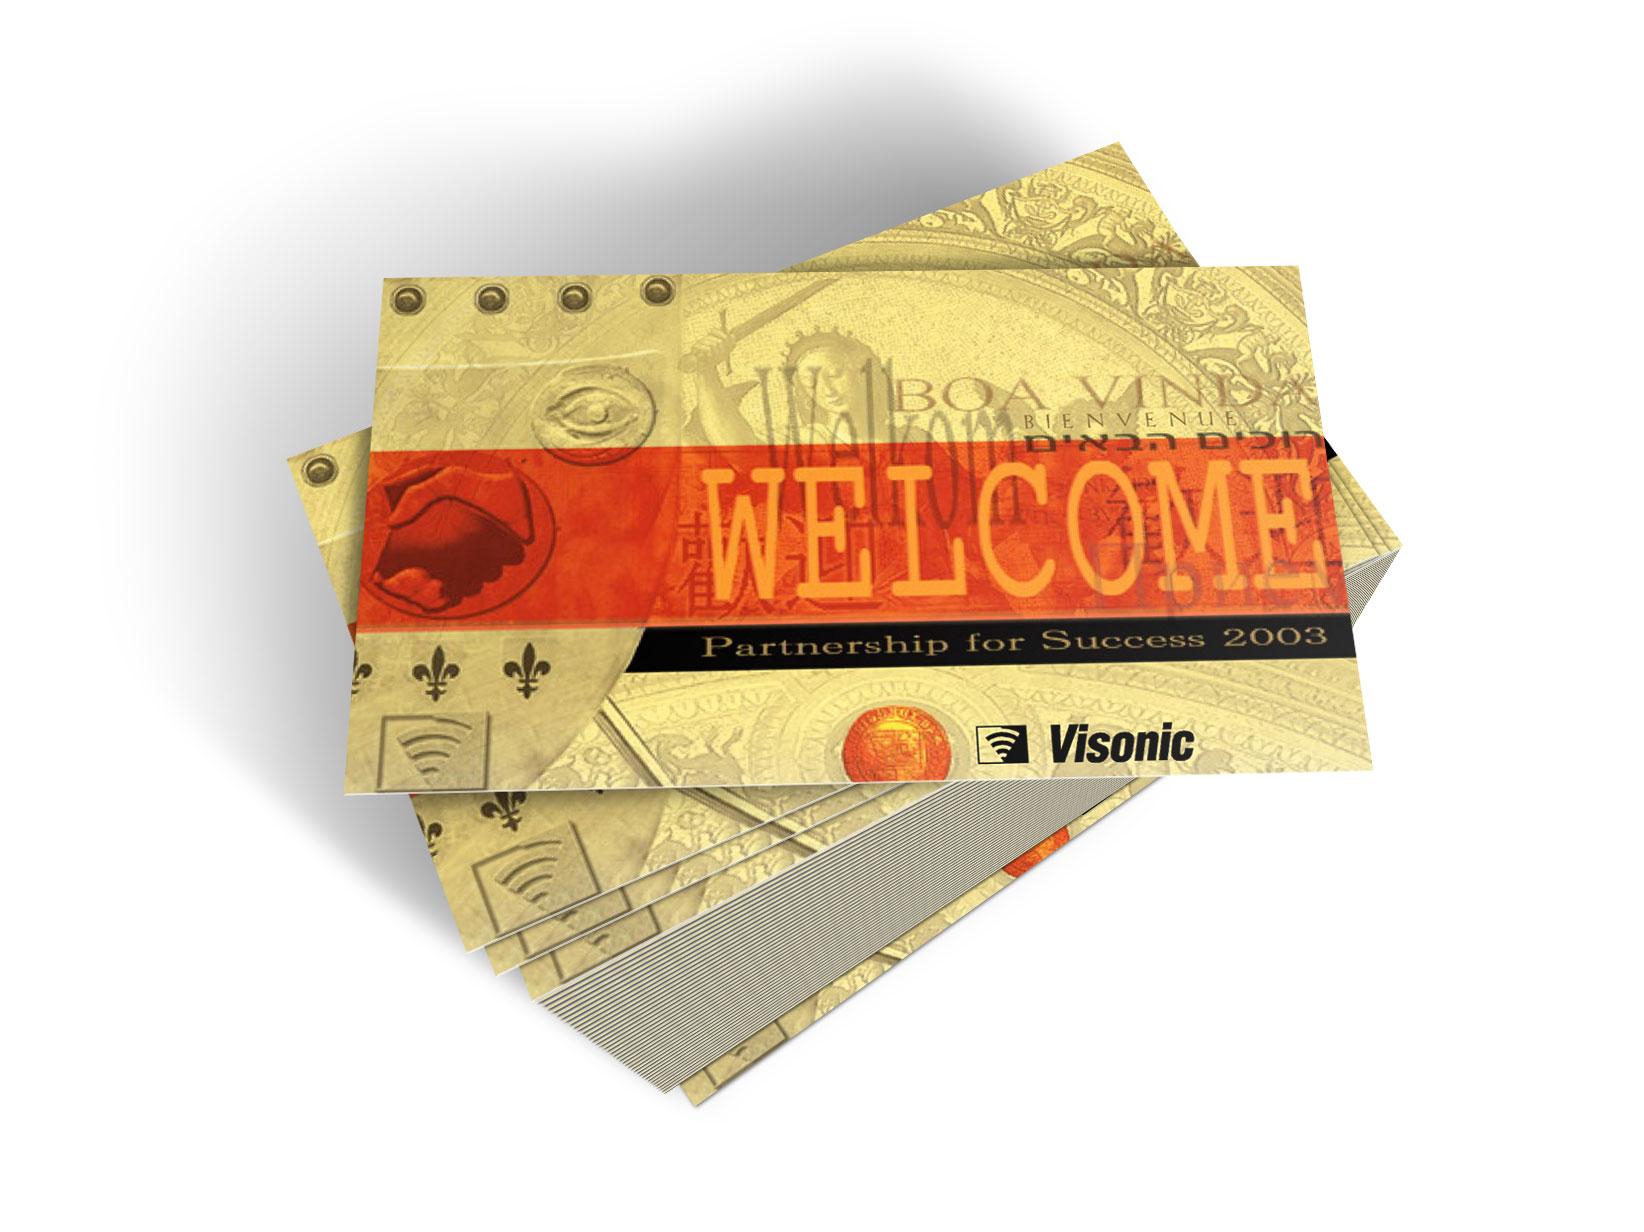 b-Spain-convention-welcome-card.jpg